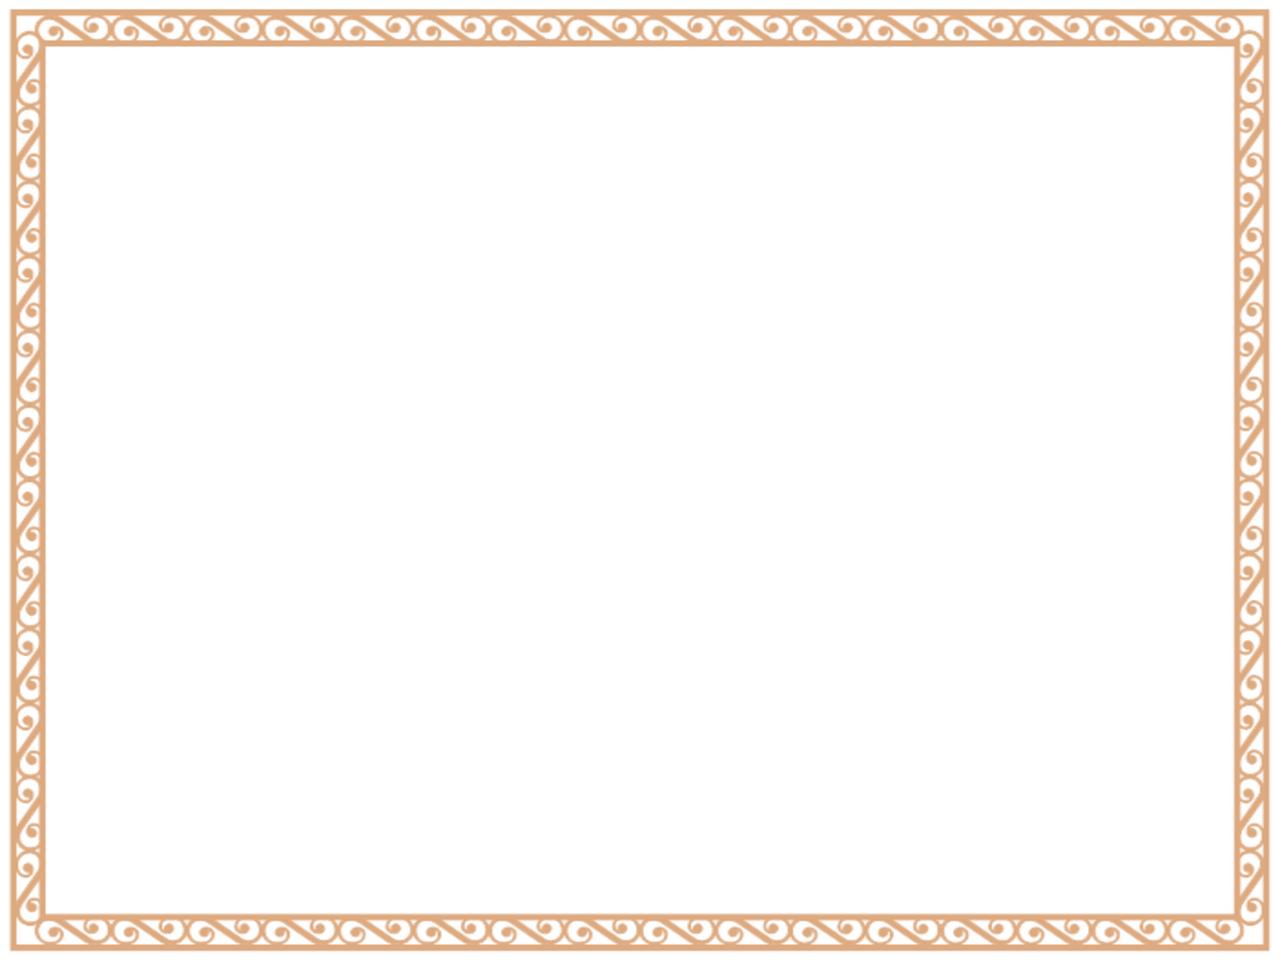 Image free printable blank certificate borders clipart library free printable blank certificate borders clipart library certificate border clip art 1500 1125g yadclub Images